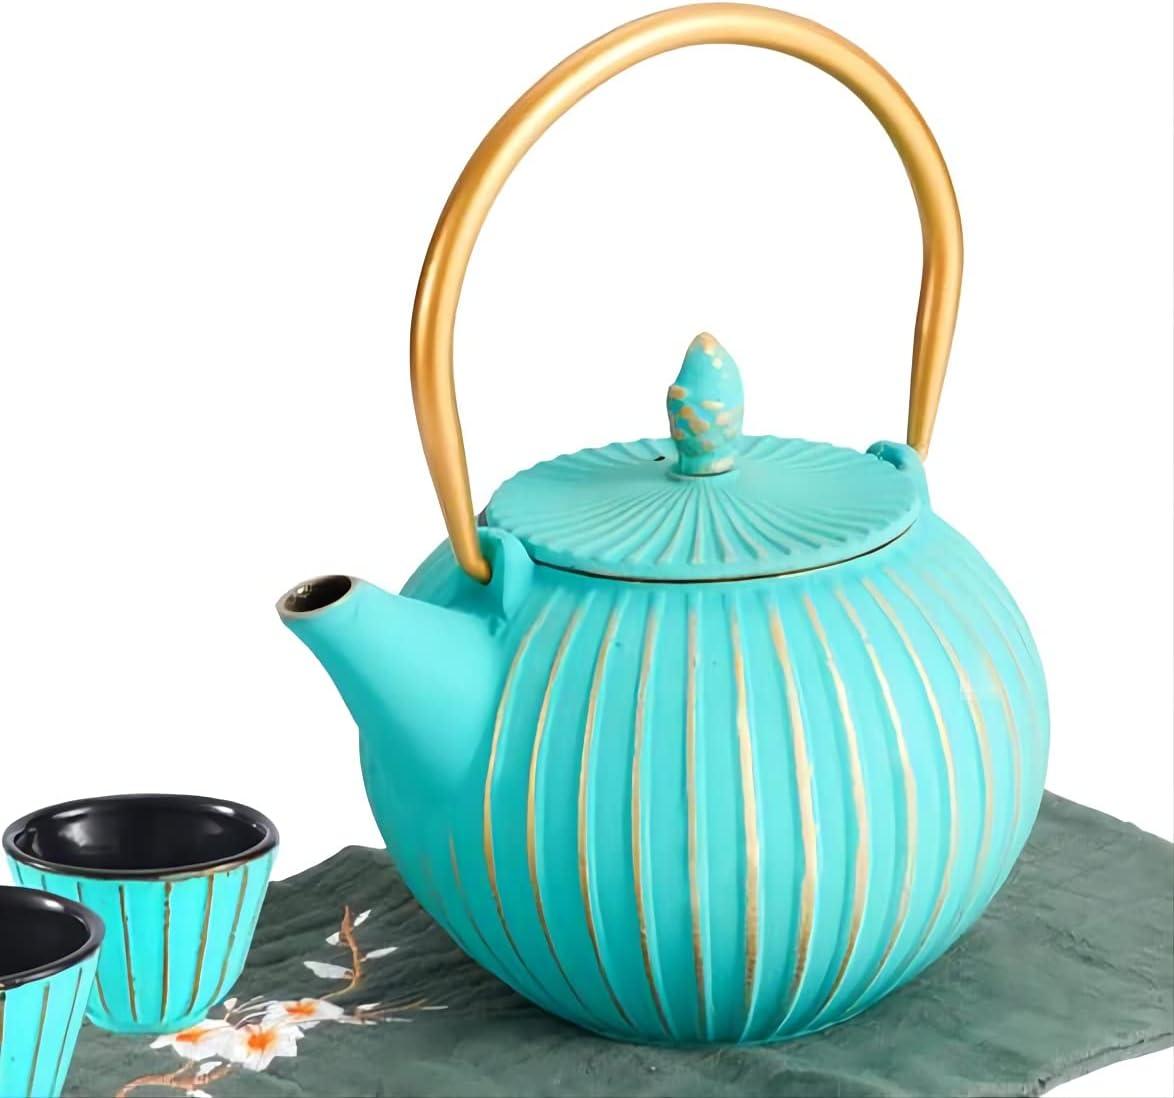 MILVBUSISS Cast Max 62% OFF Iron Teapot with fo Regular dealer Tea Kettle 2 Cups